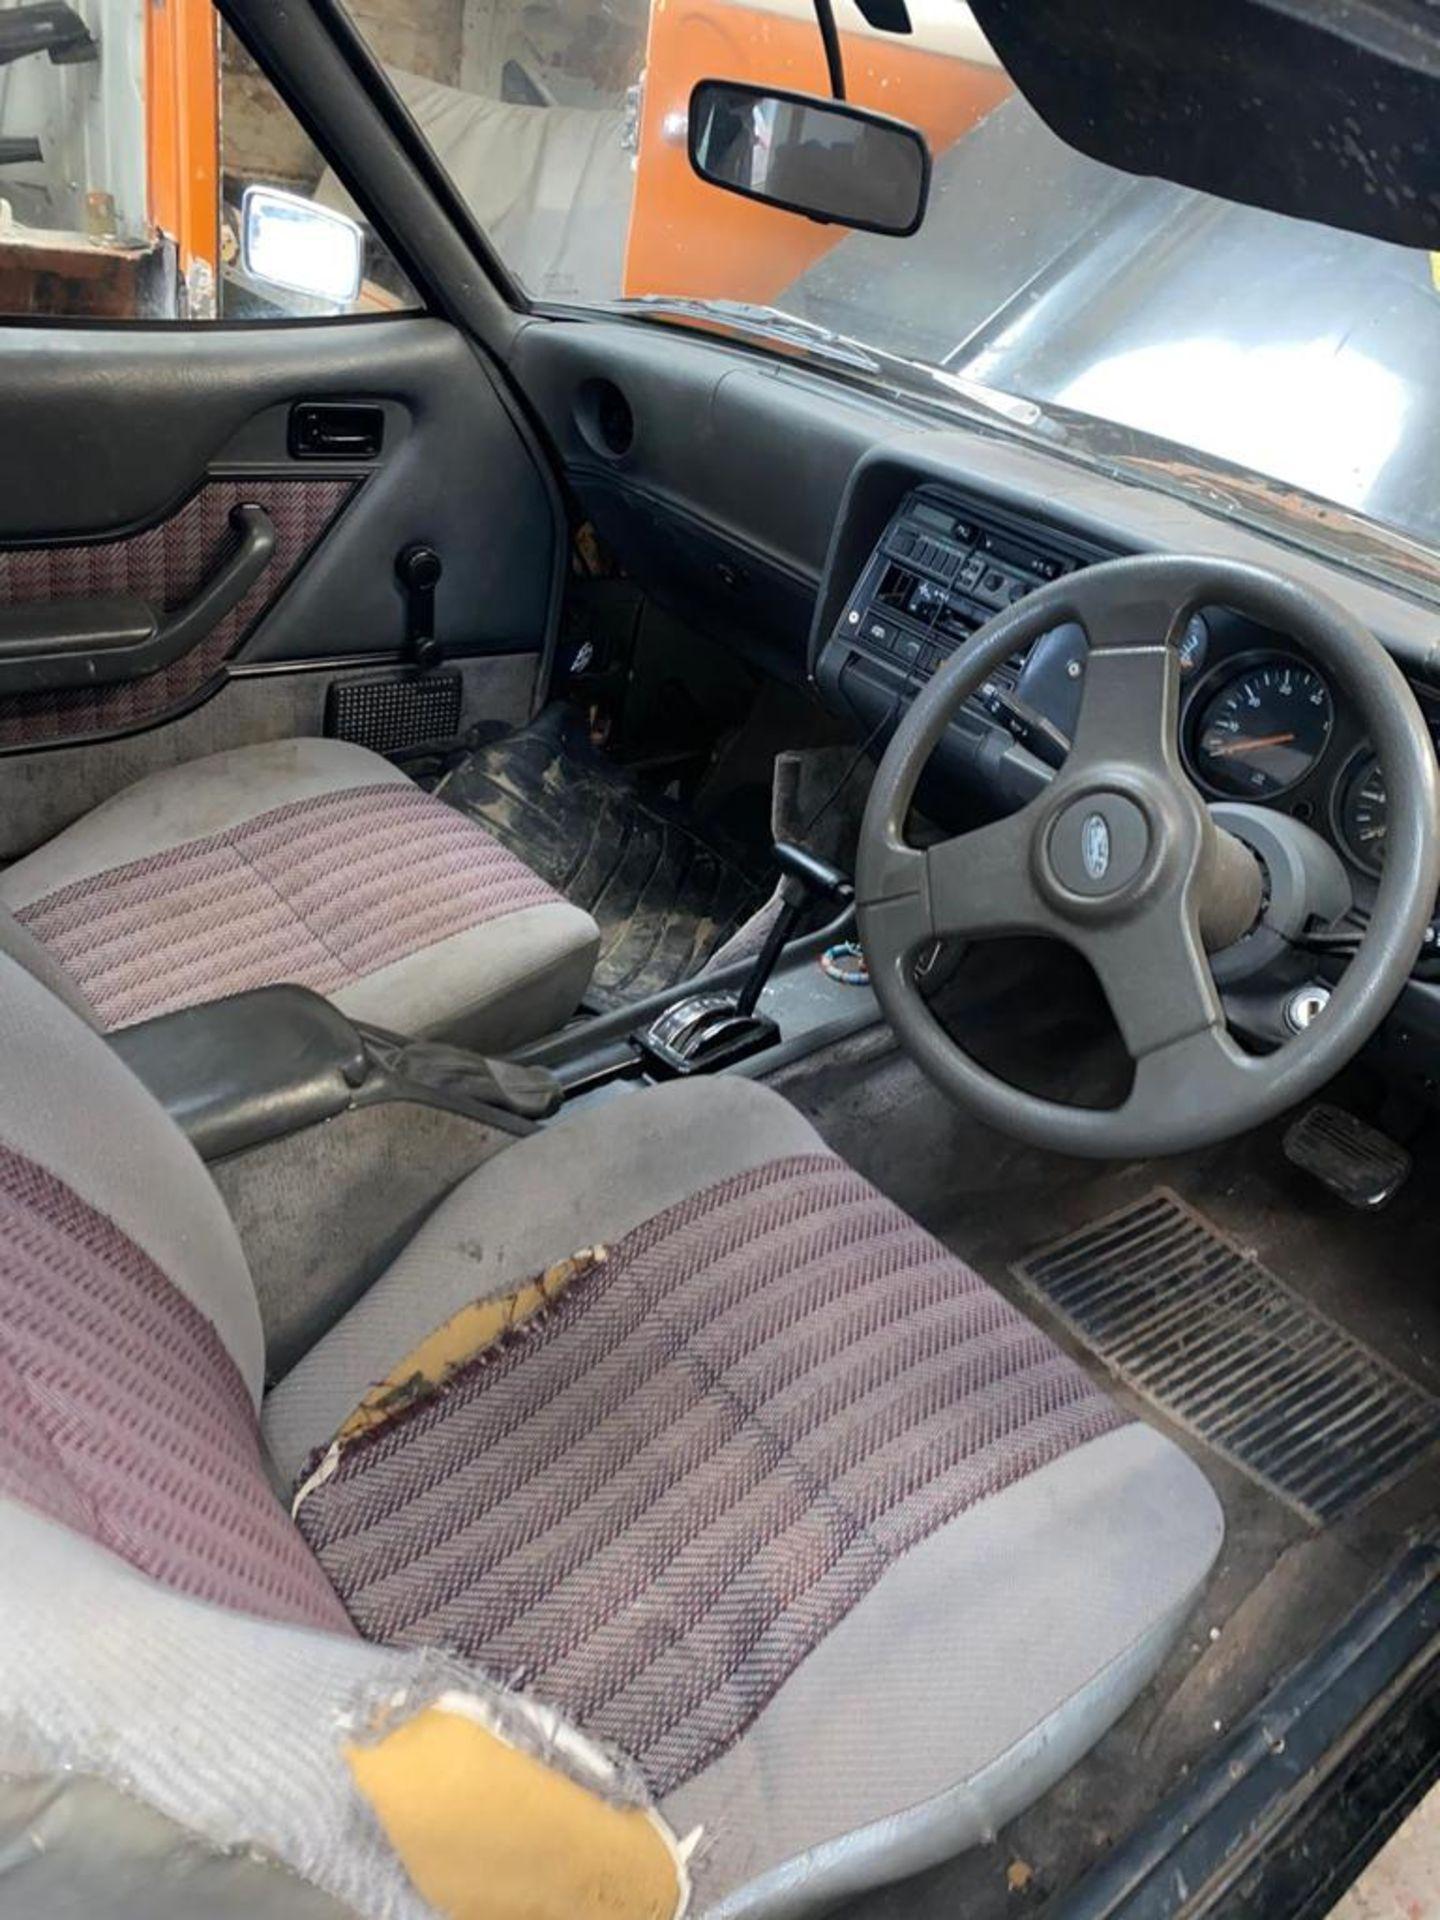 1986/C REG FORD CAPRI LASER AUTO 2.0 PETROL BLACK 3 DOOR *NO VAT* - Image 18 of 32